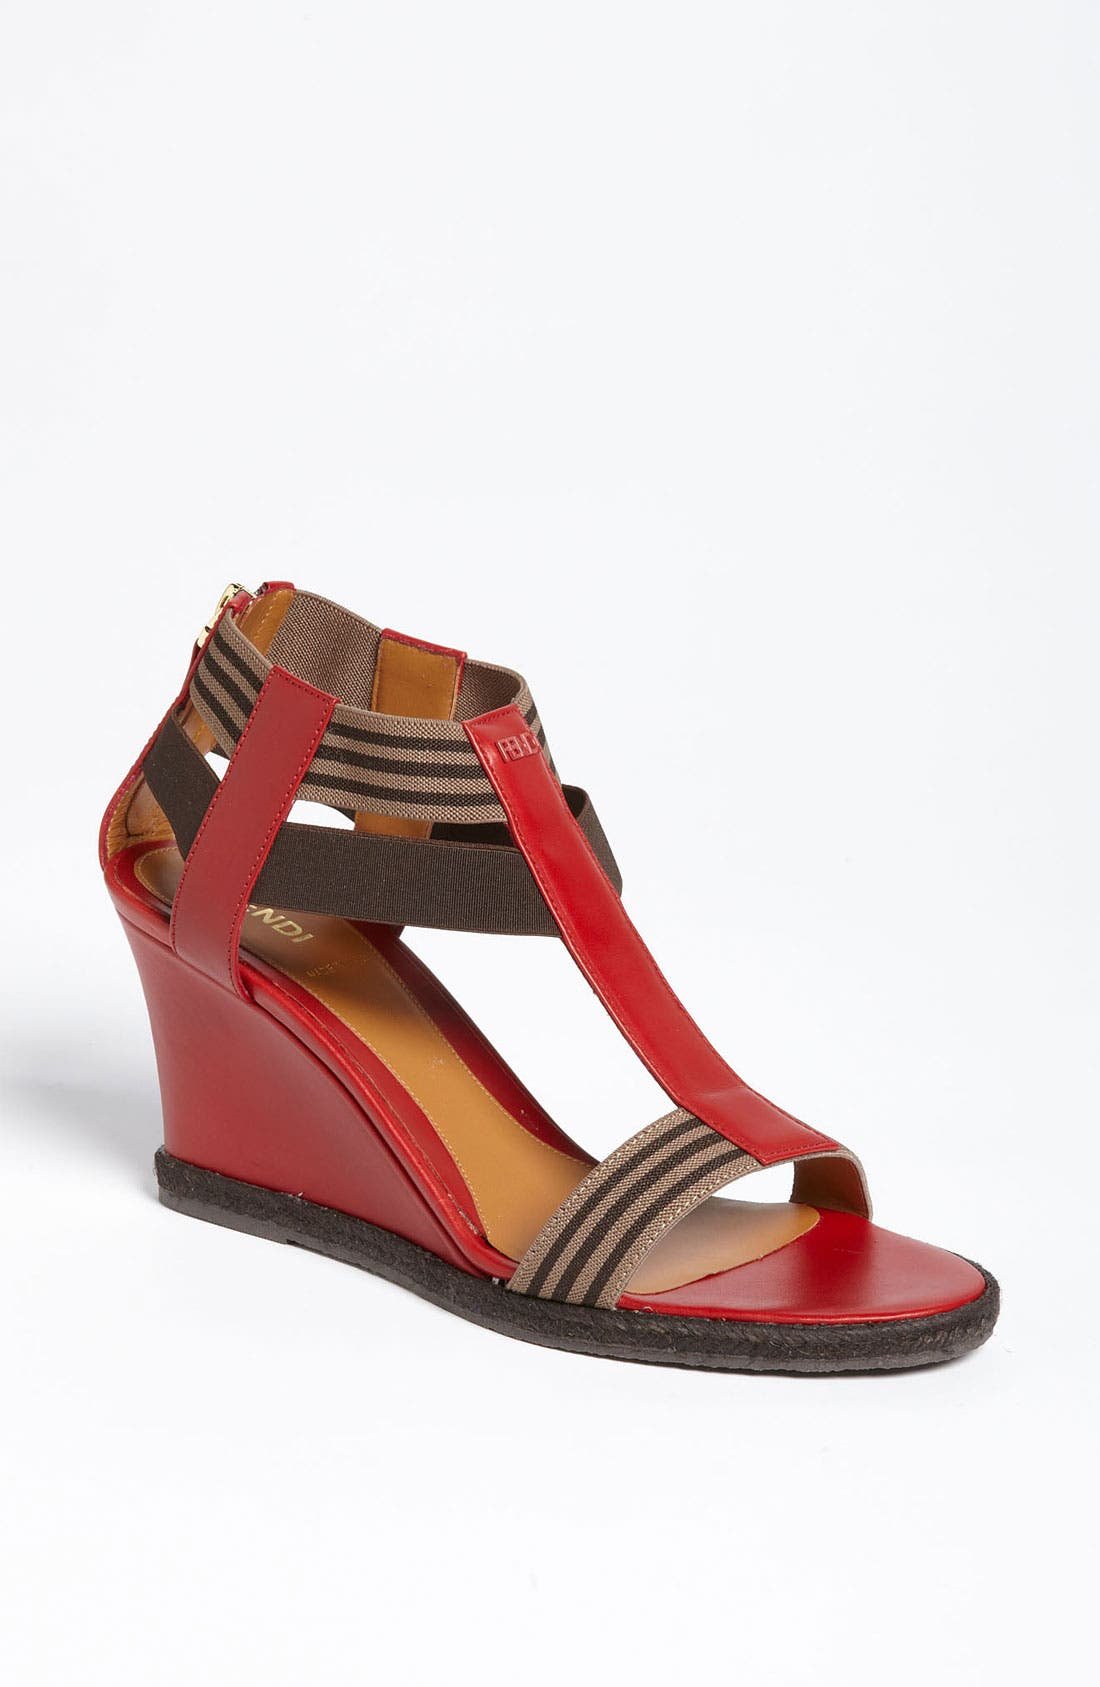 Main Image - Fendi 'Carioca' Wedge Sandal